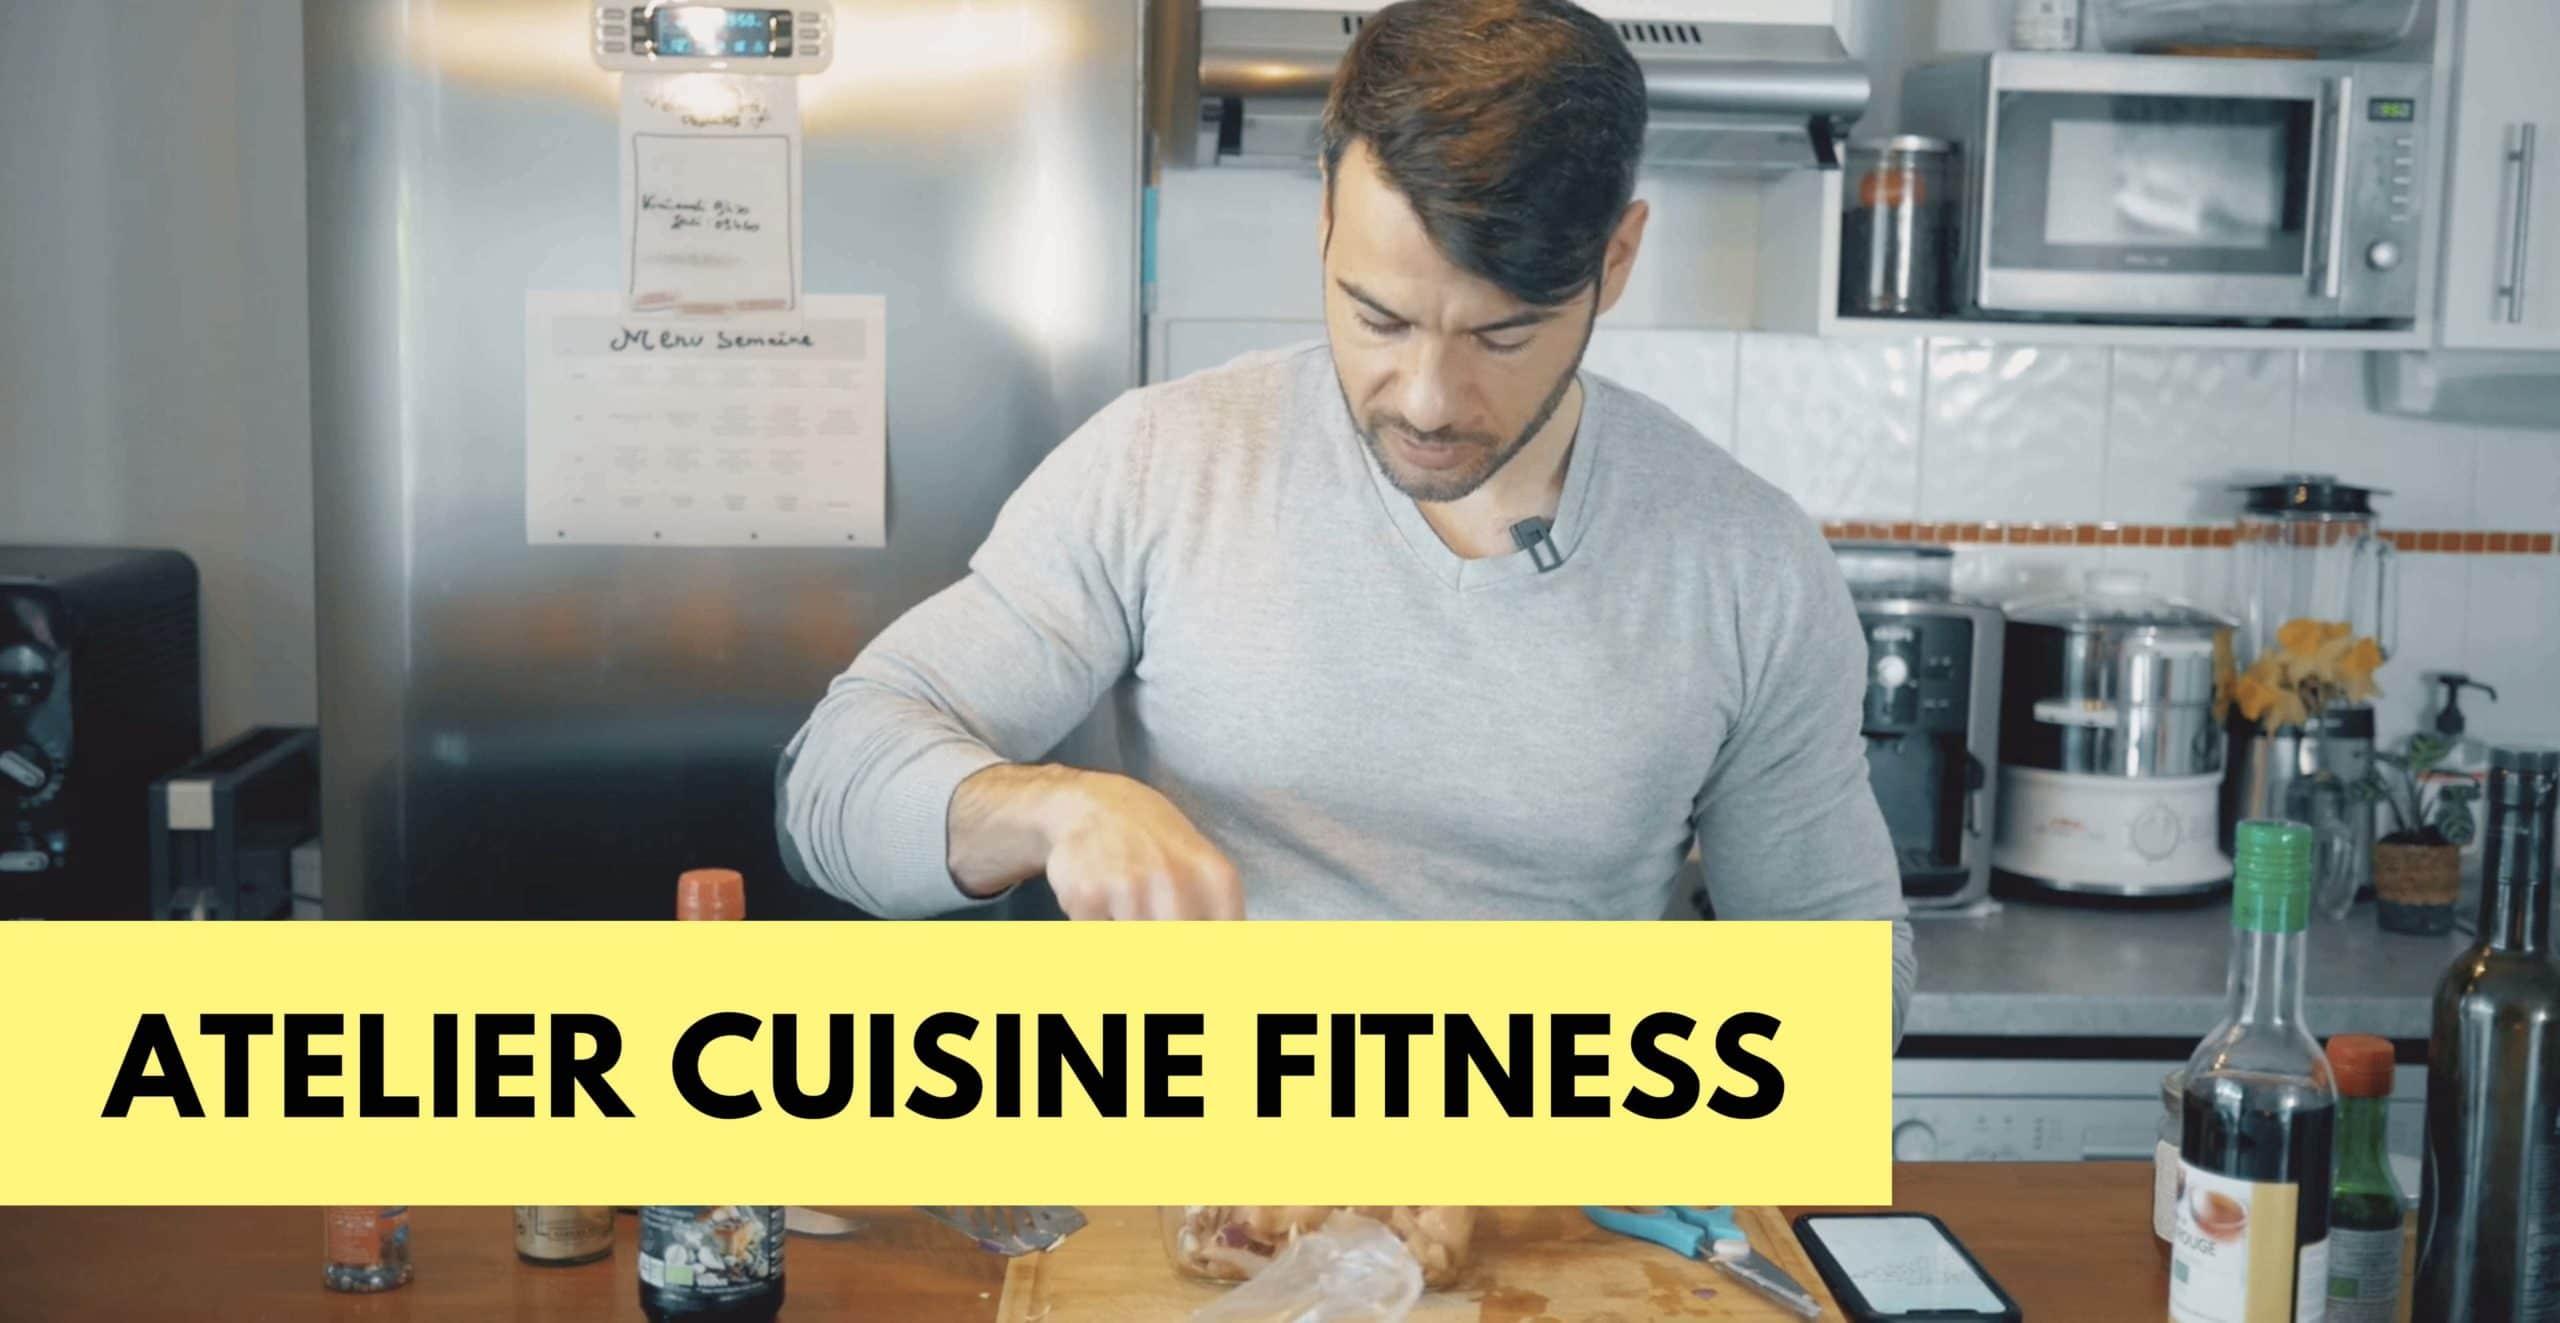 atelier cuisine fitness